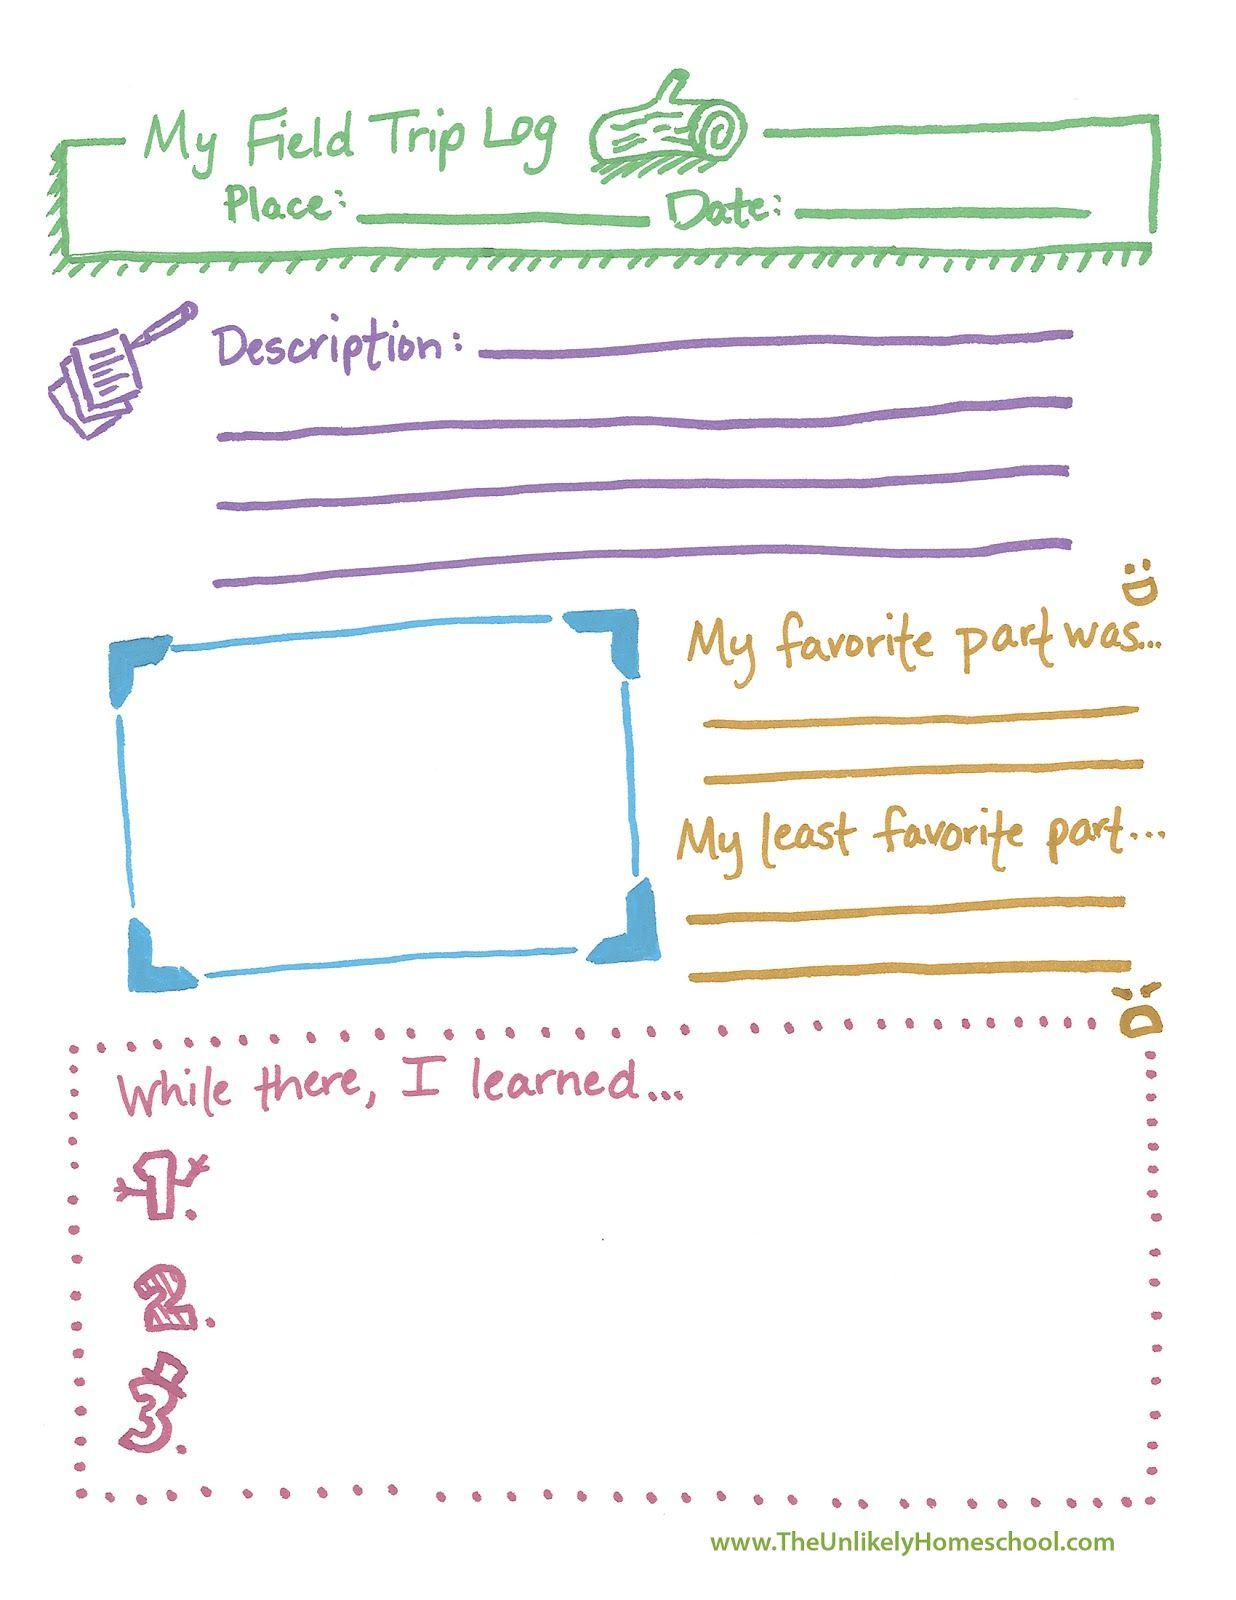 The Unlikely Homeschool Free Field Trip Log Notebook